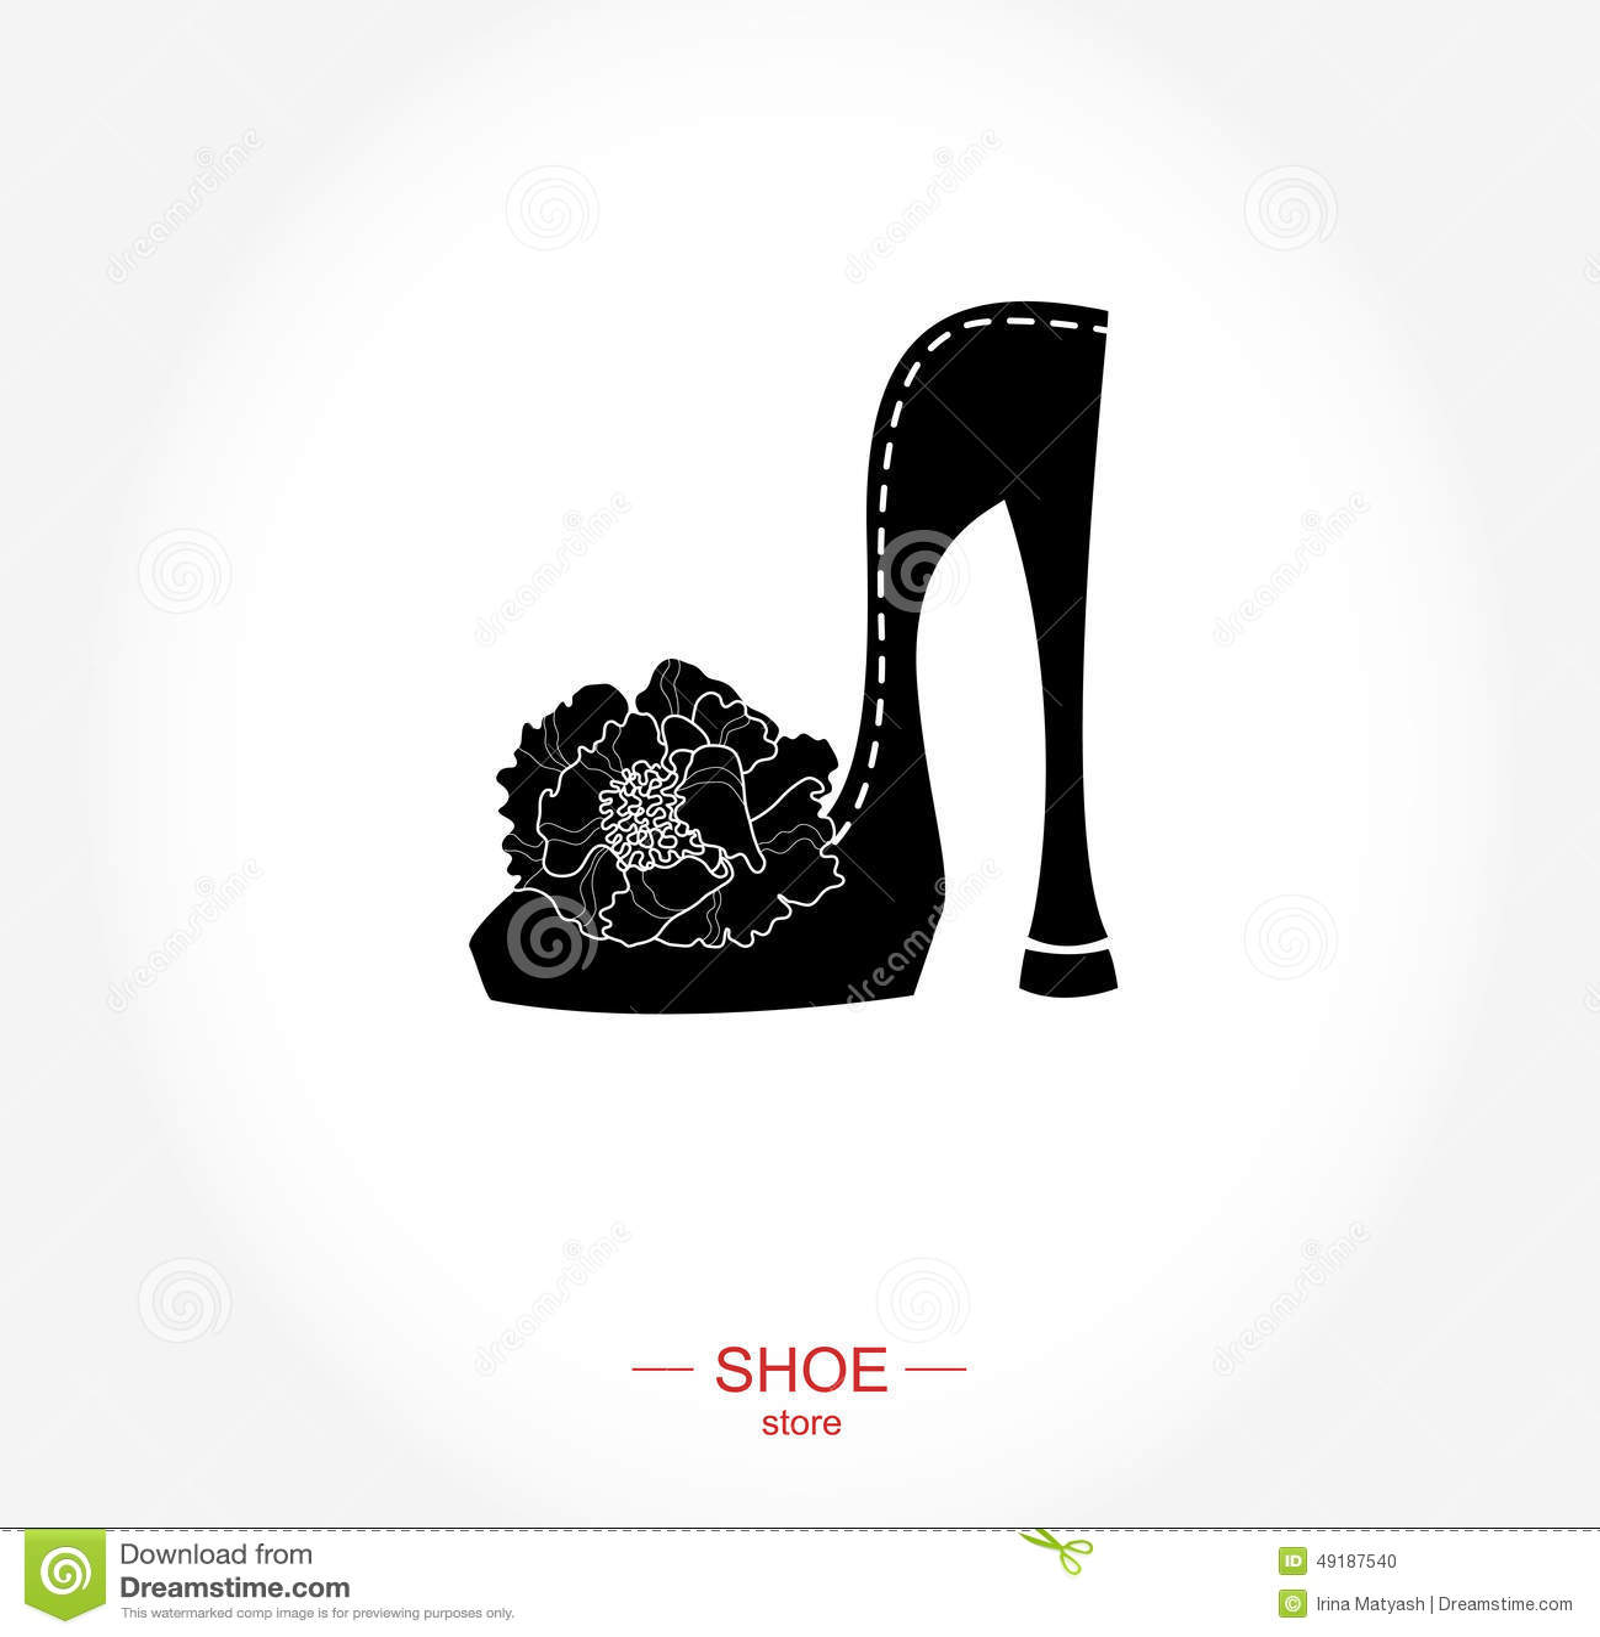 Stock vector logo shoe store shop fashion collection boutique